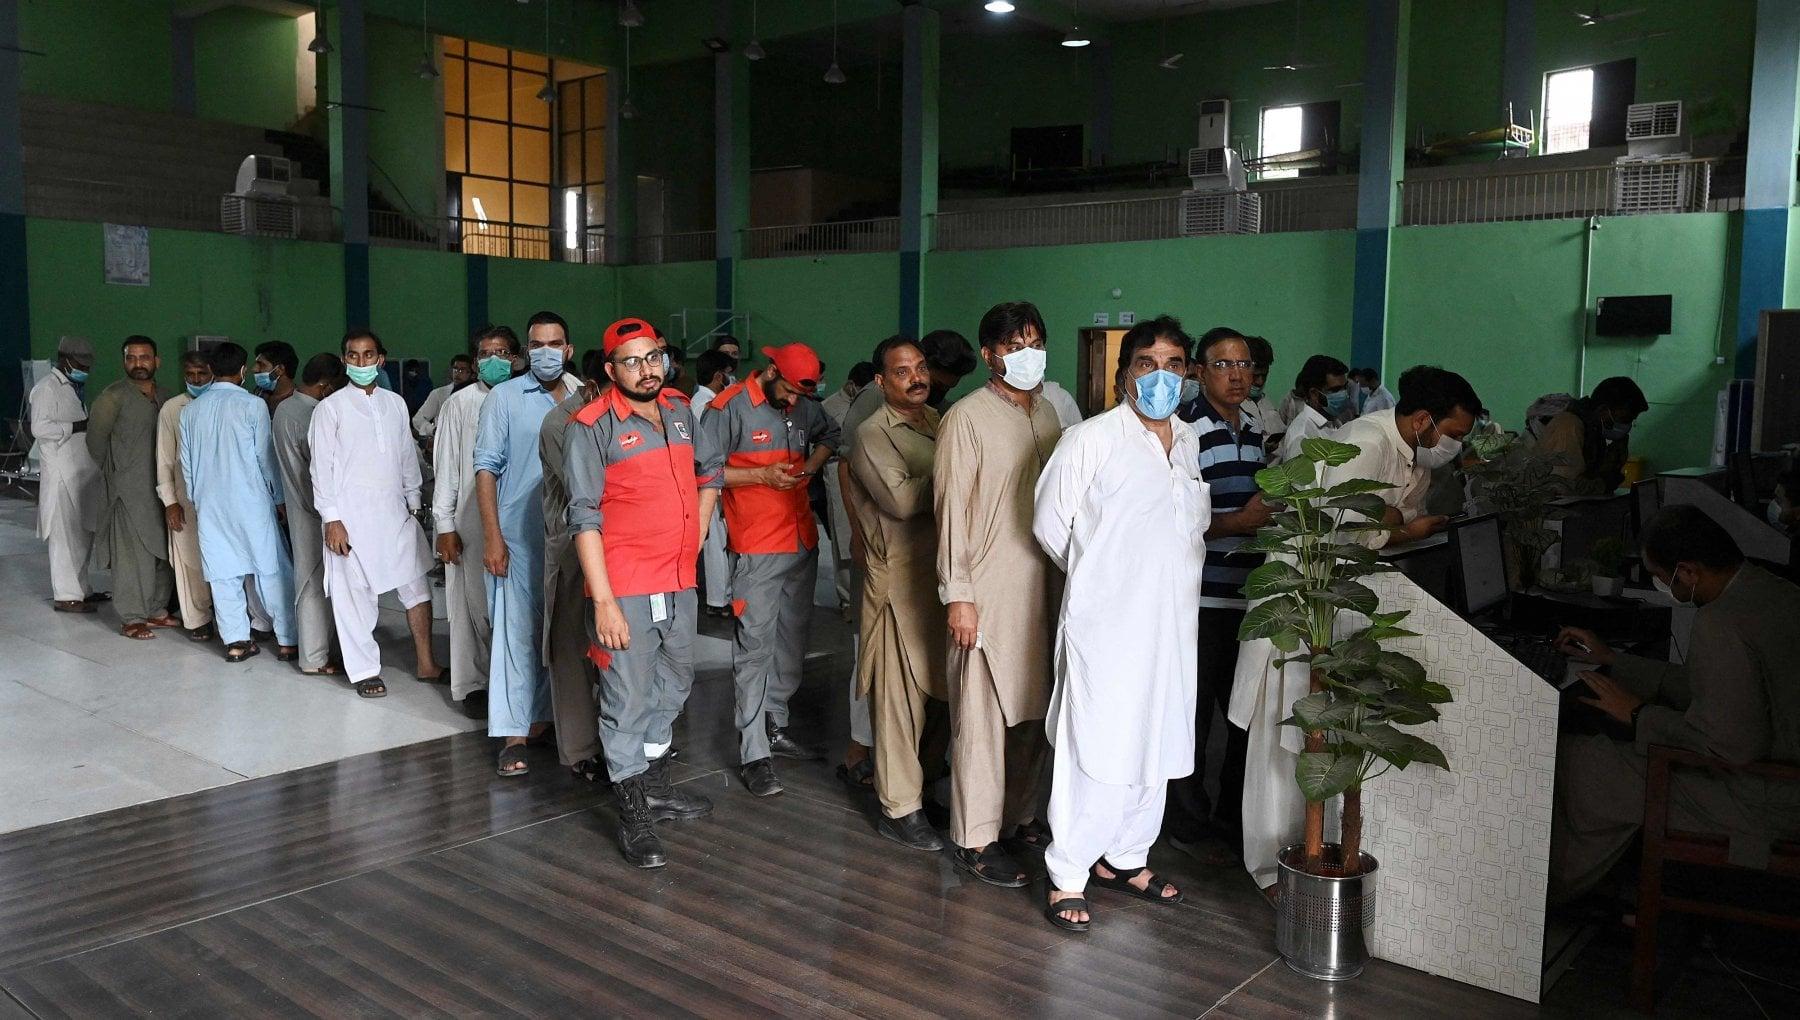 175633578 98bab476 9b49 4df3 a8a2 df67367612f8 - Pakistan, nel Punjab tagliano il telefono a chi rifiuta di vaccinarsi